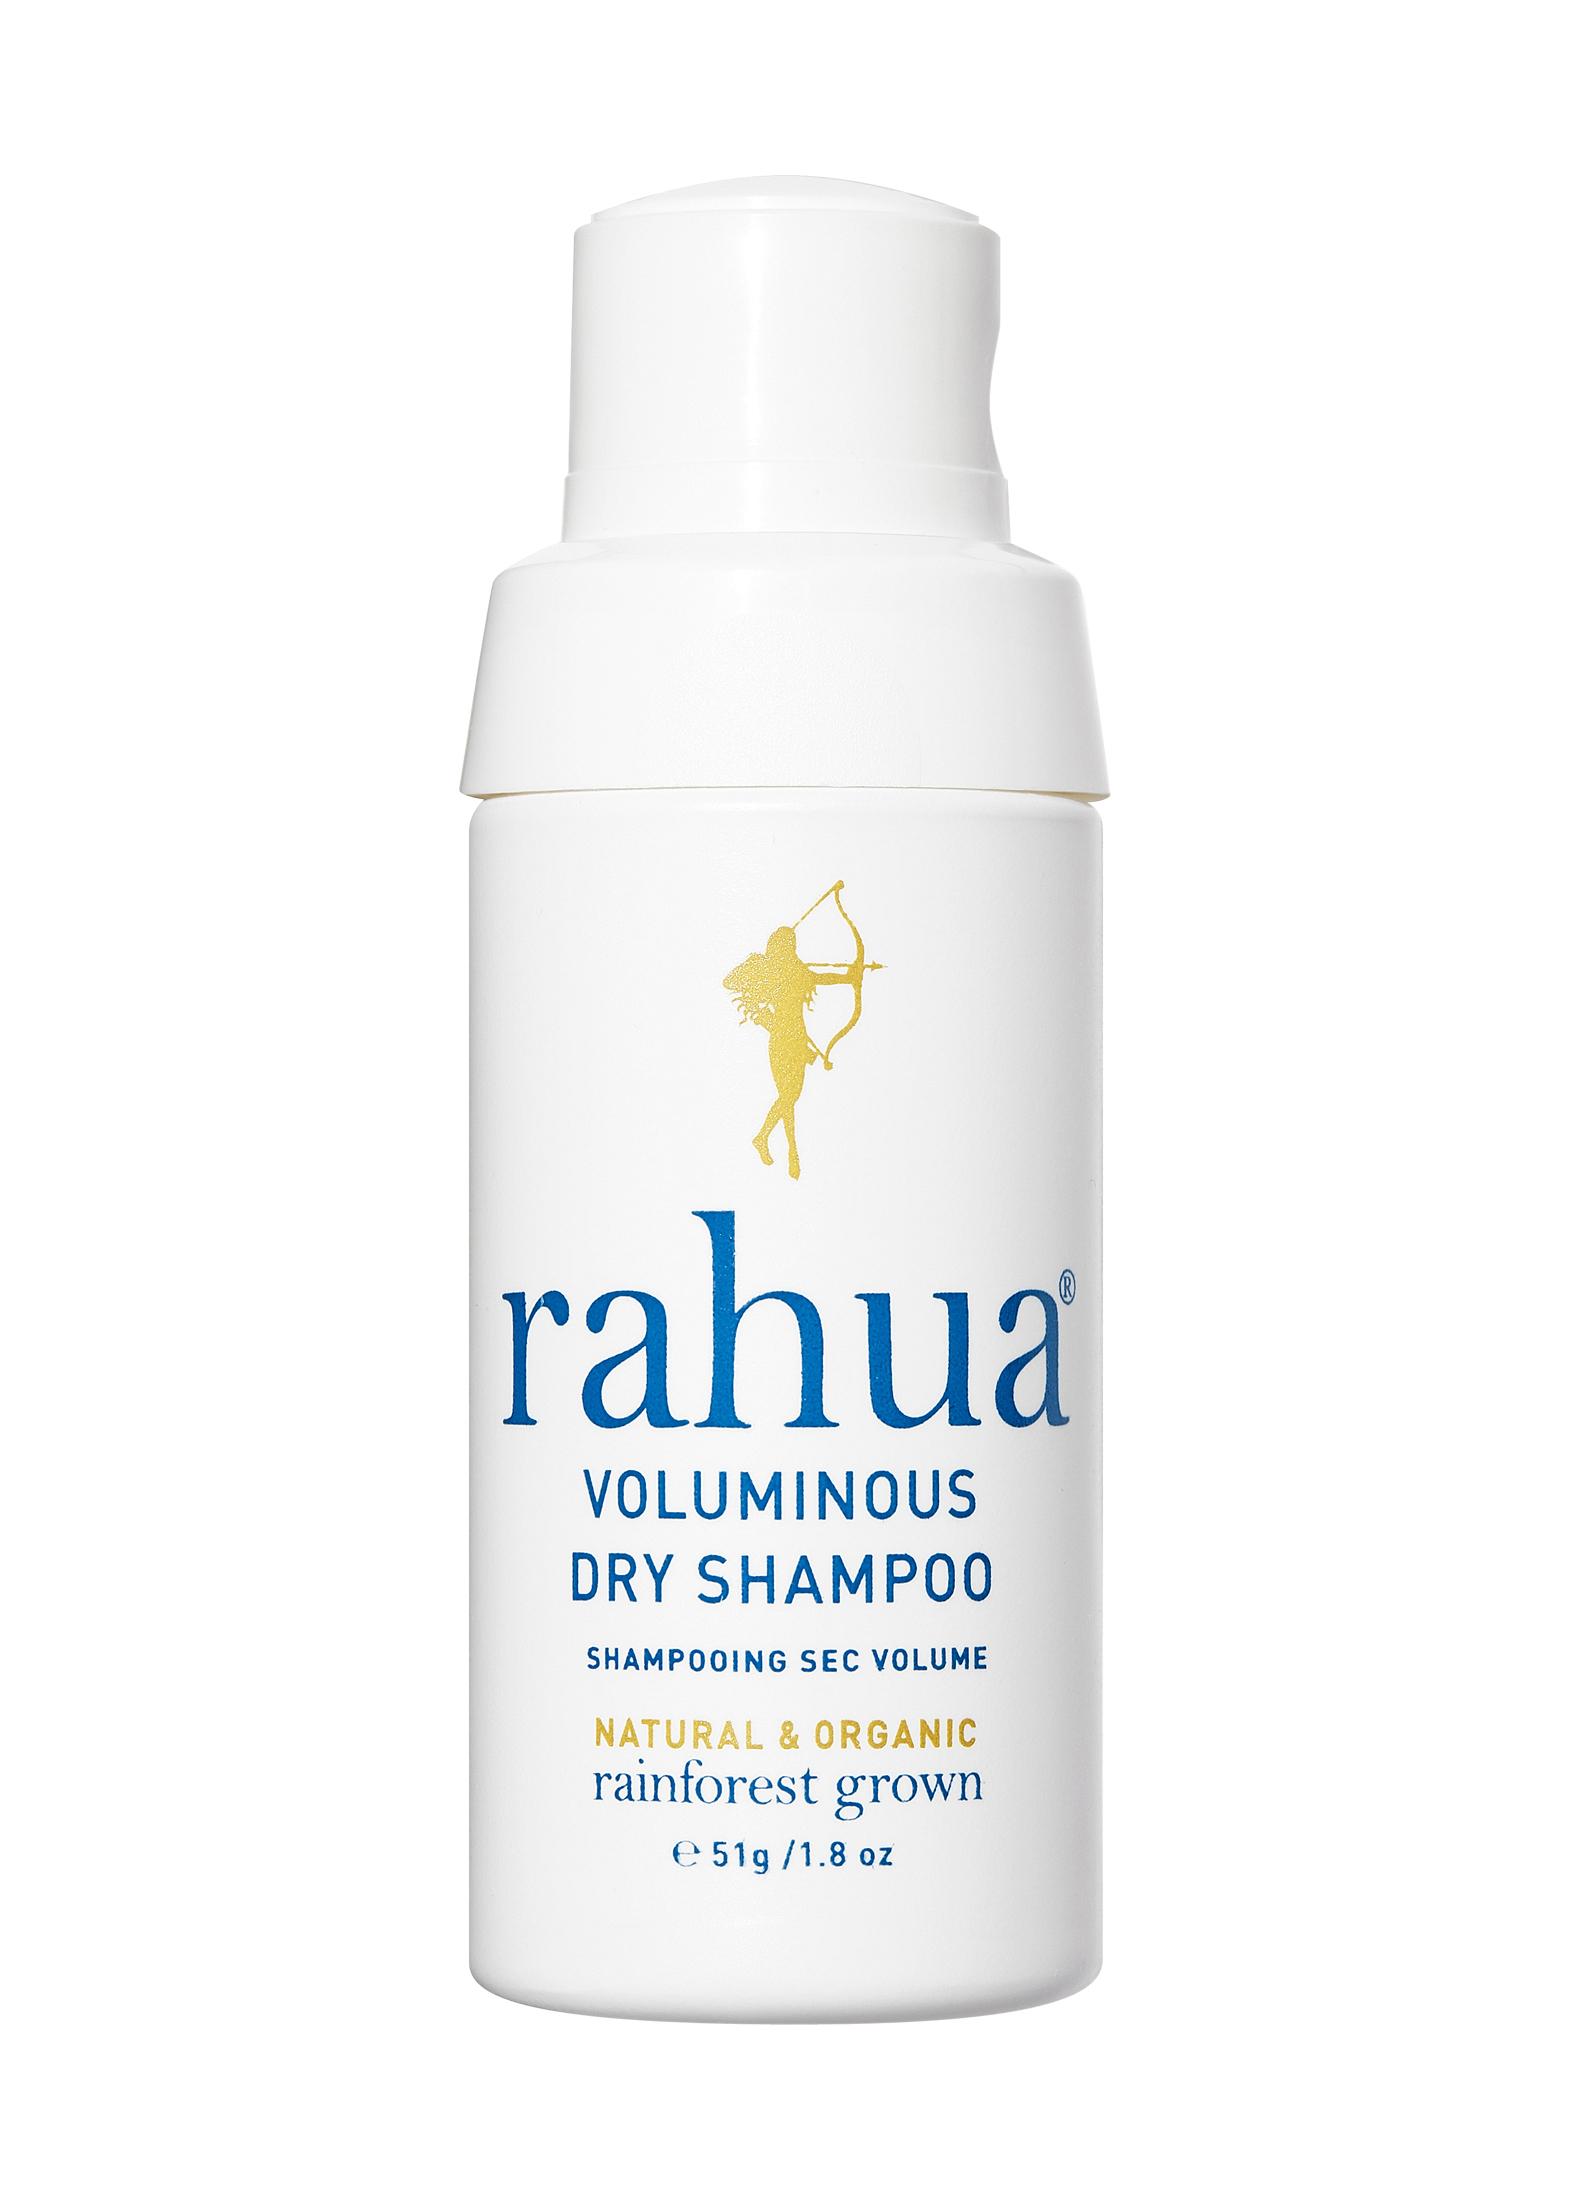 Rahua Voluminous Dry Shampoo image number 0